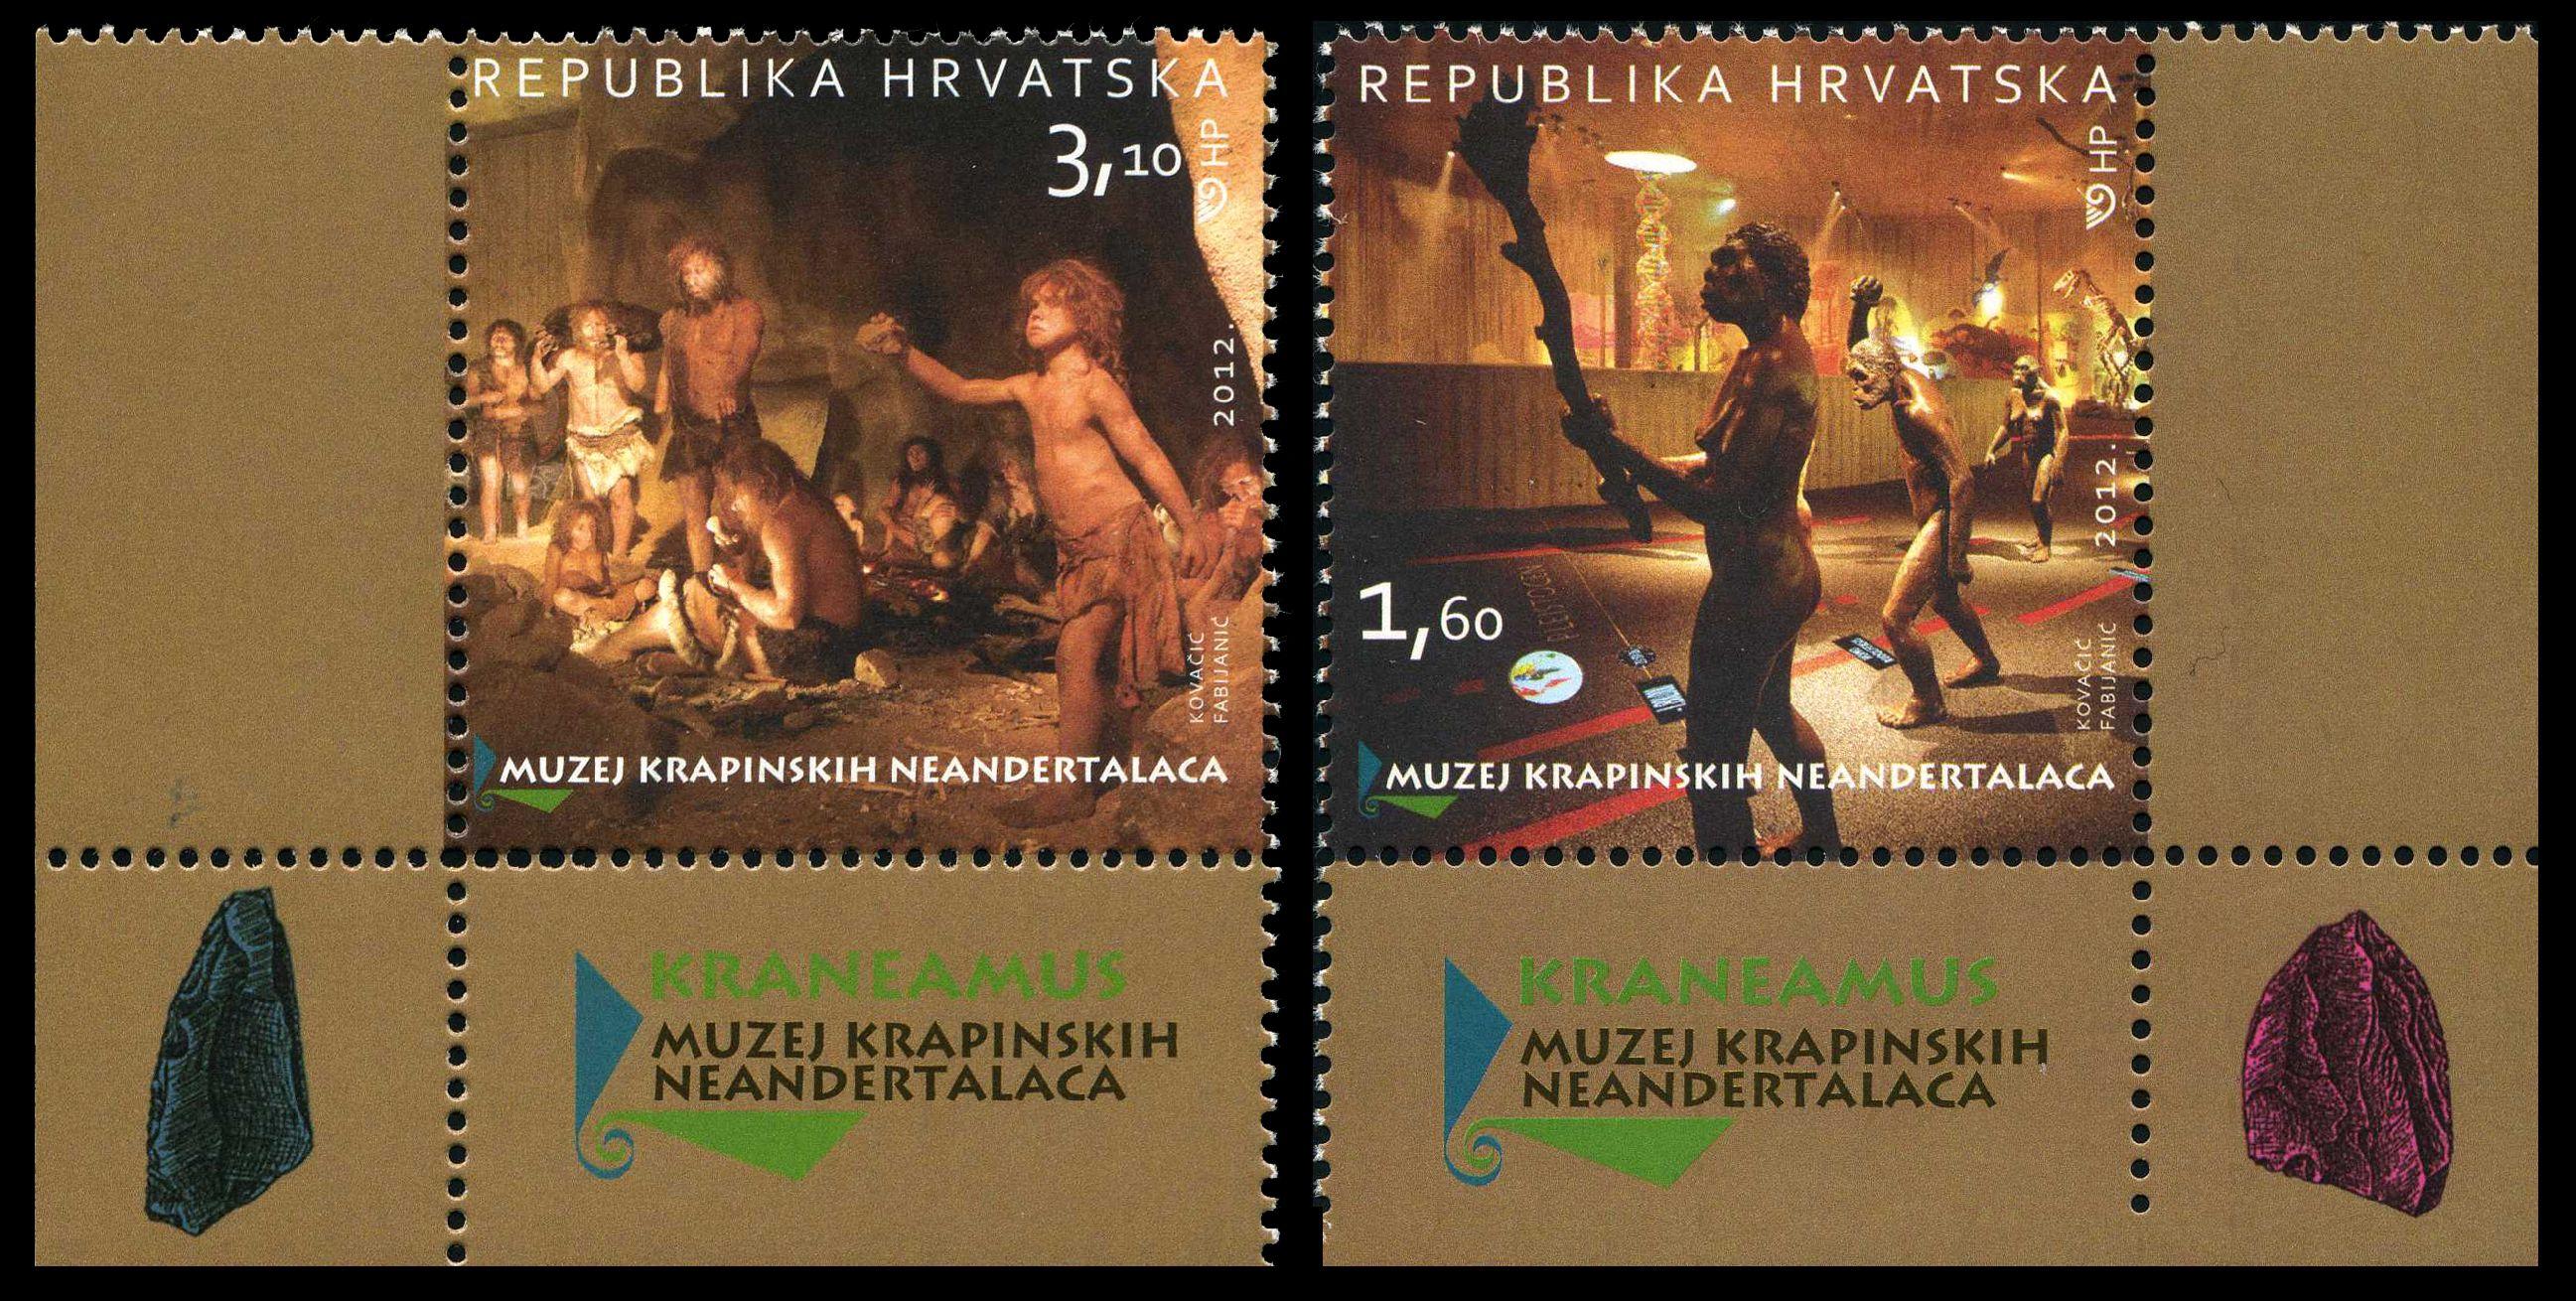 Paleophilatelie: Paläontologie und Philatelie  Croatia_2012